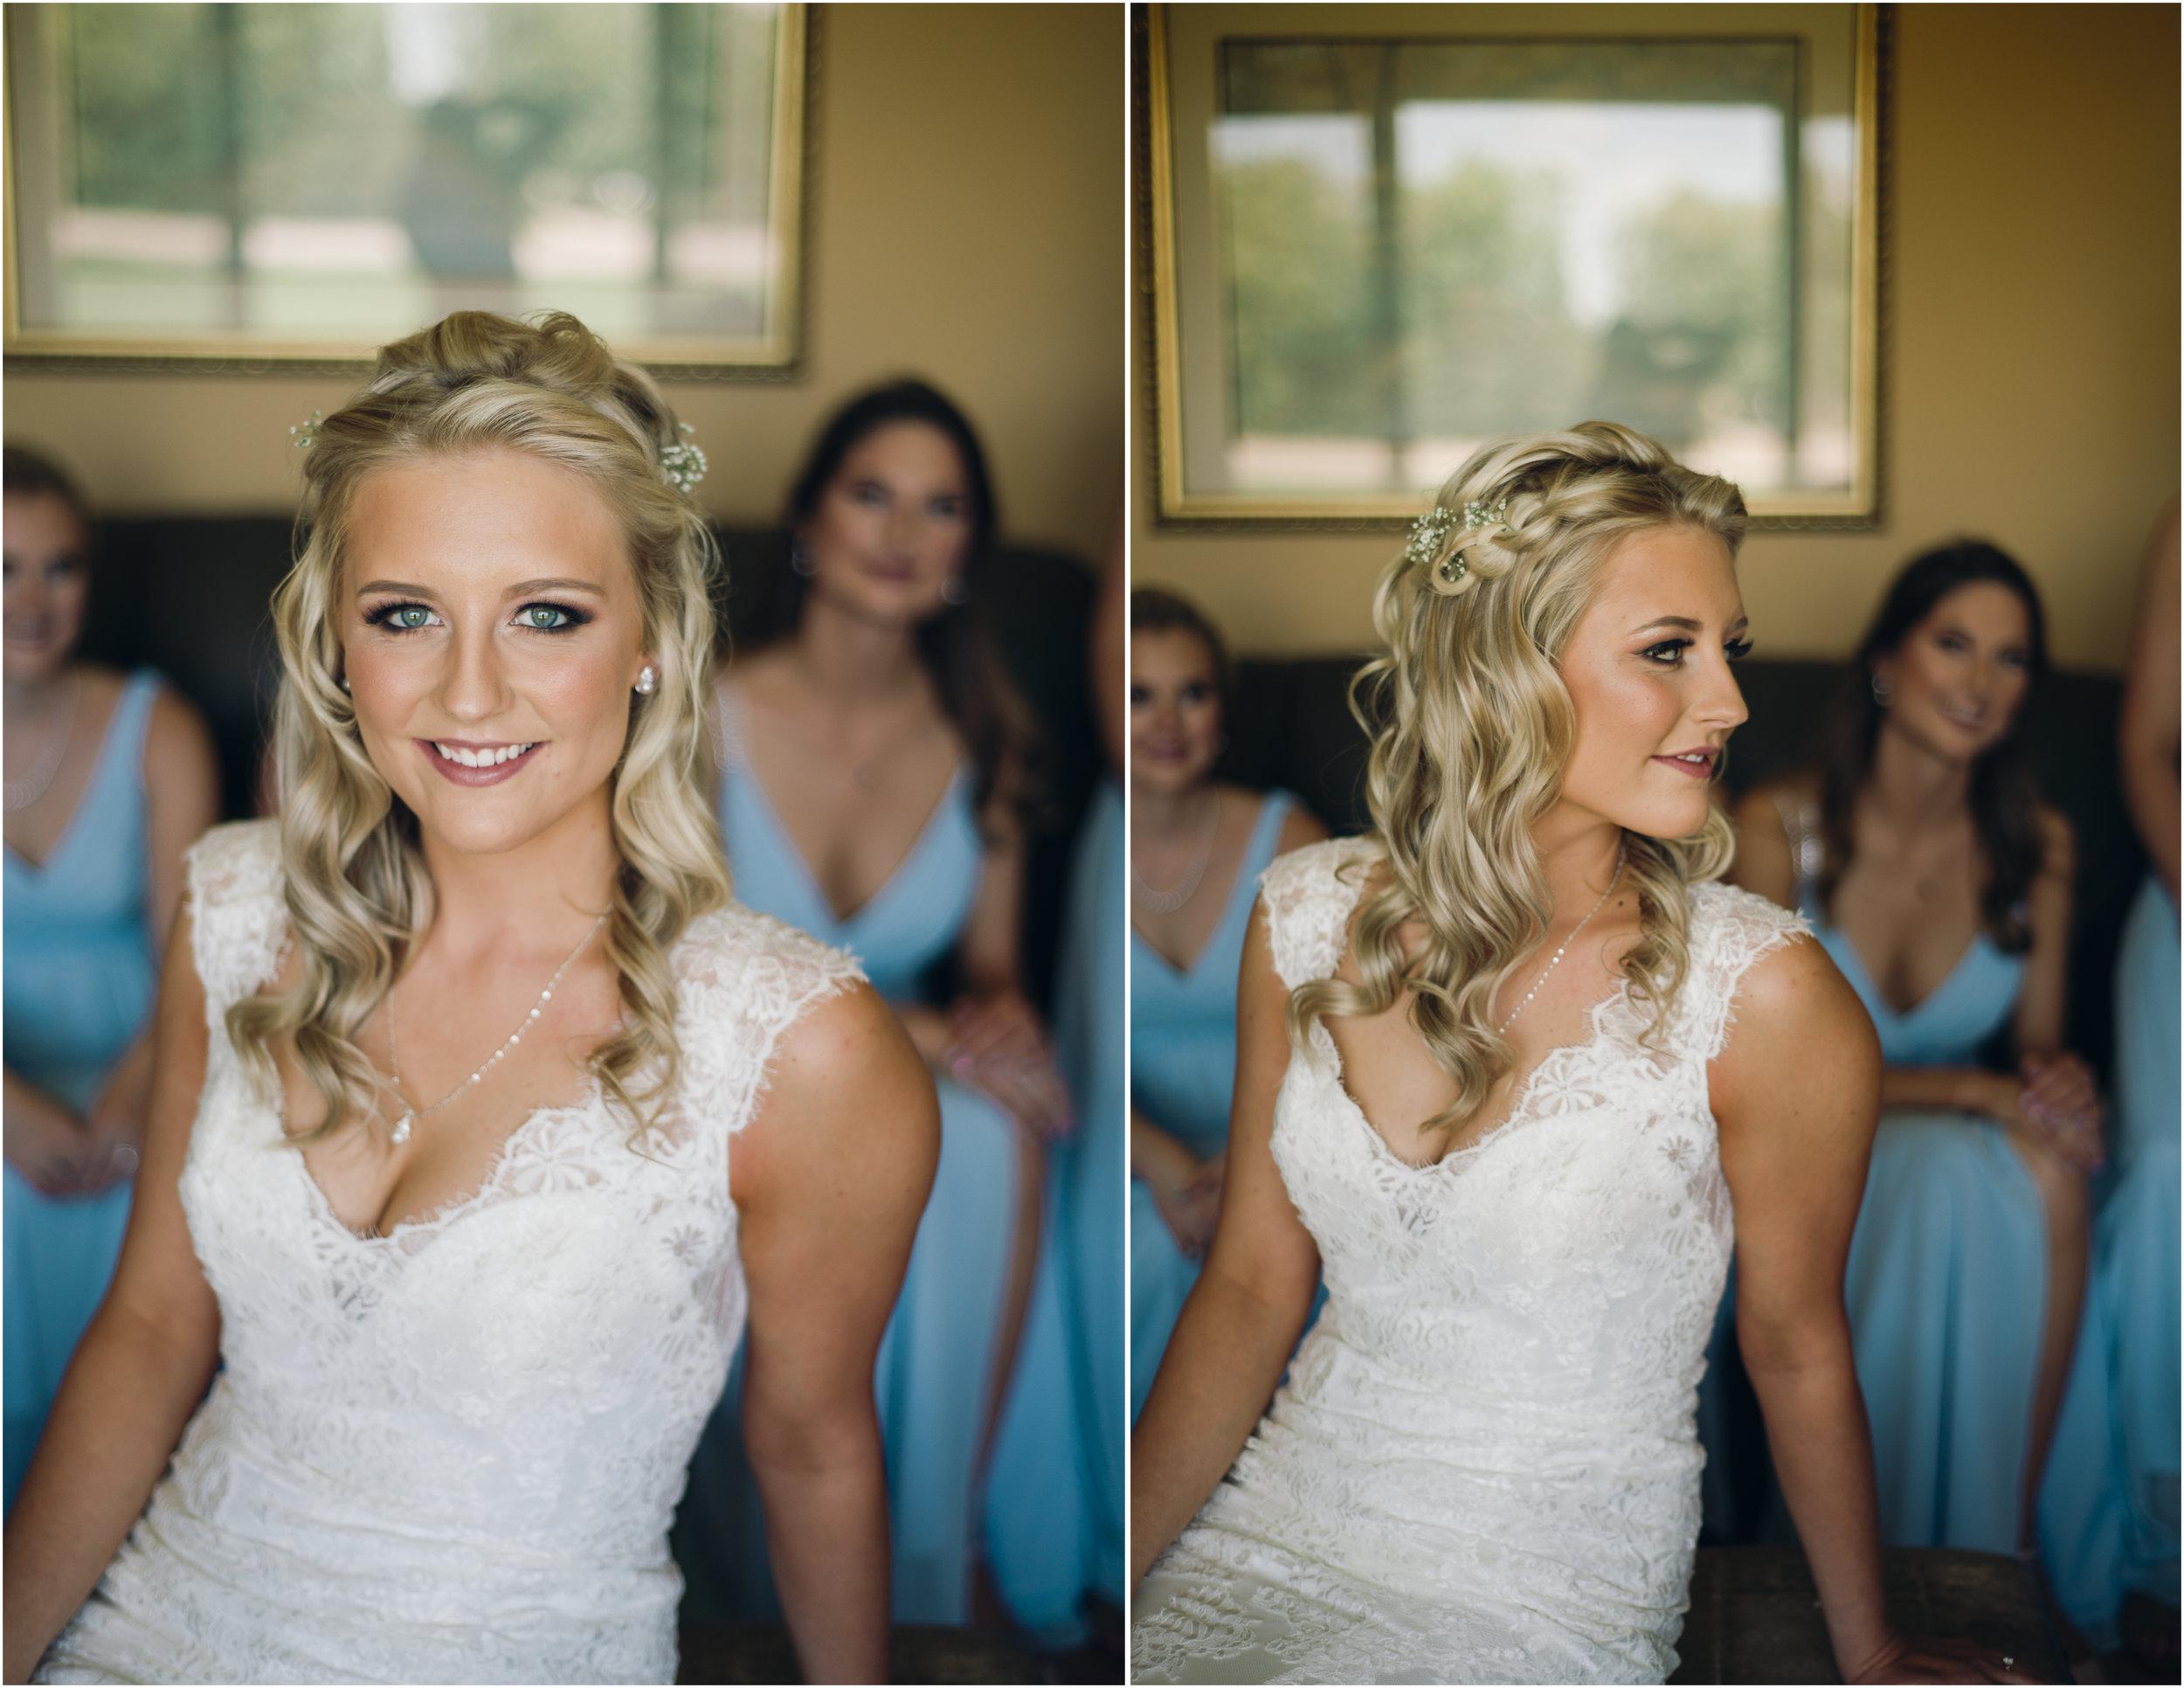 Kingston Wedding_2x2_1.jpg